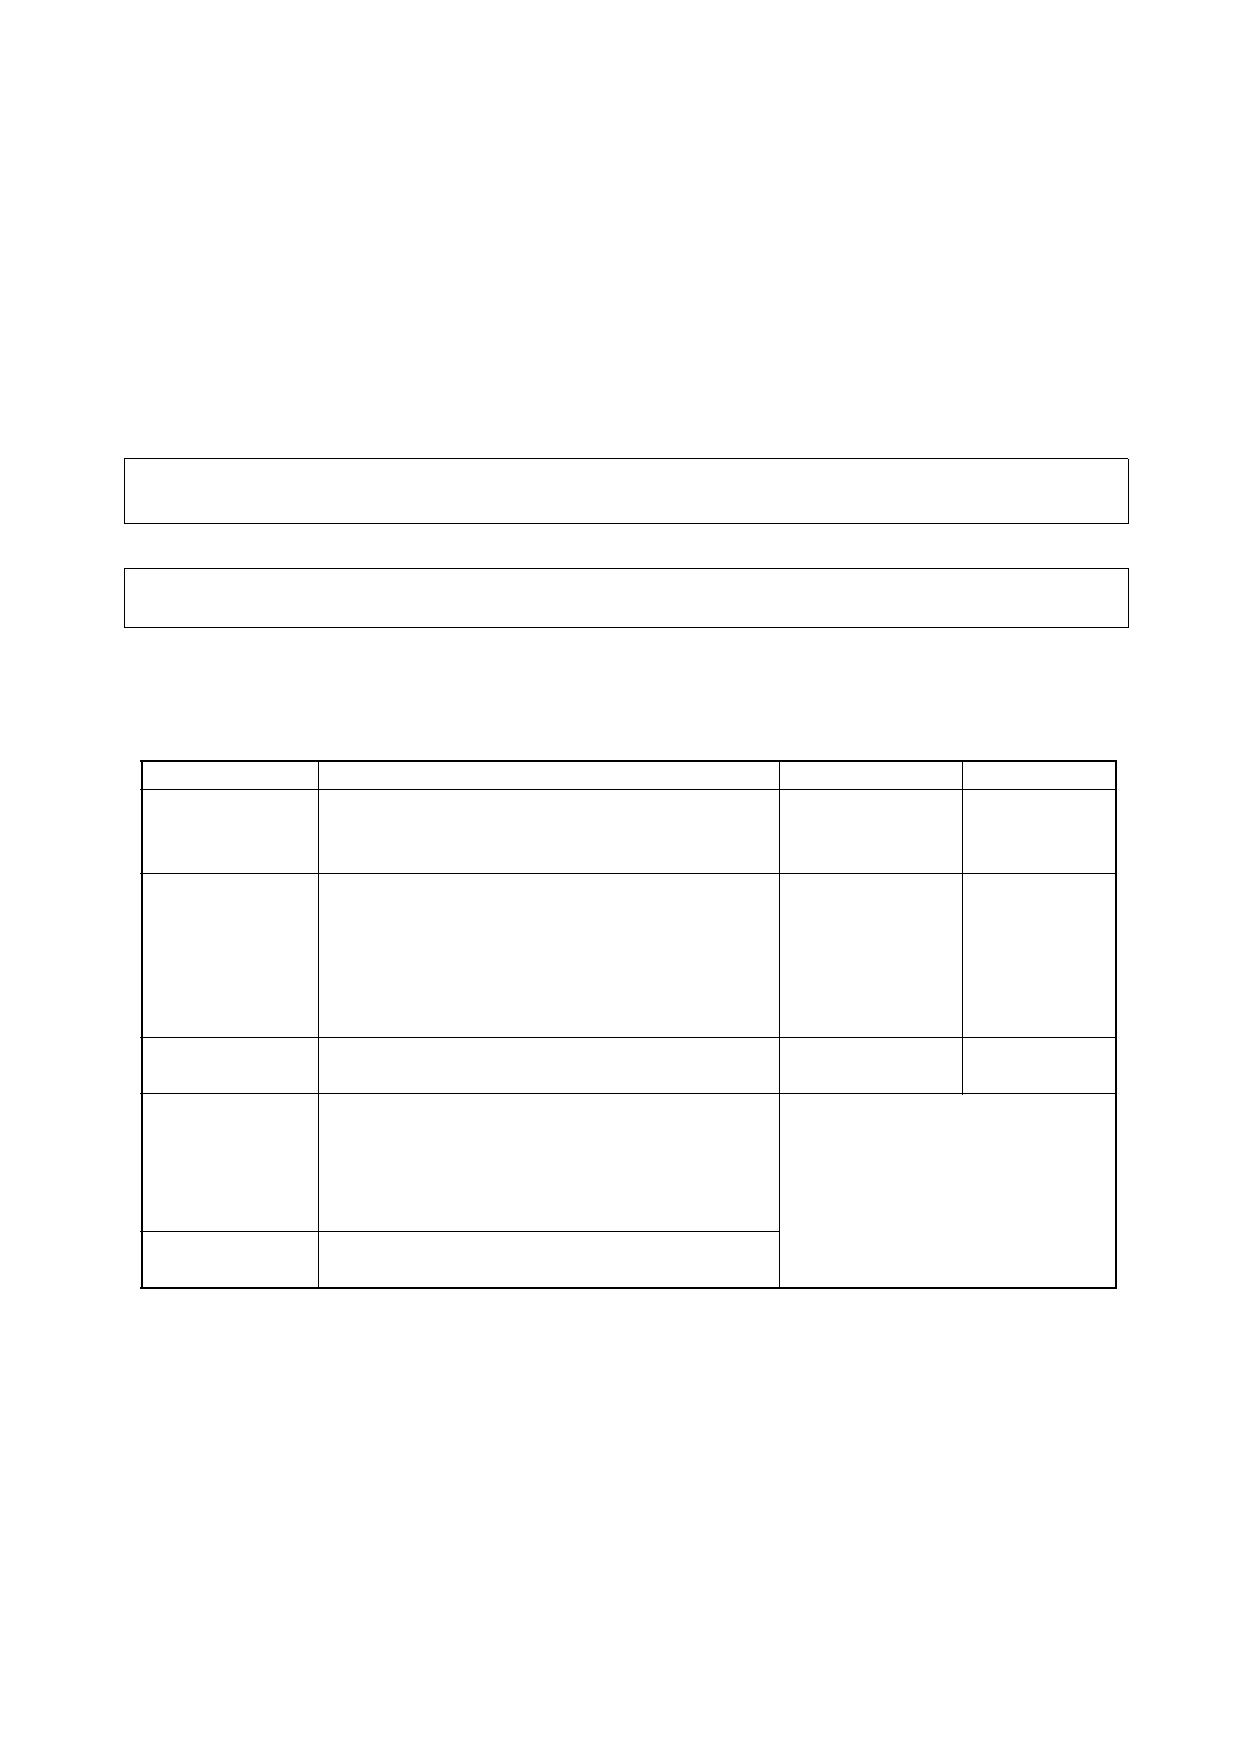 R5F21217KFP pdf, 반도체, 판매, 대치품